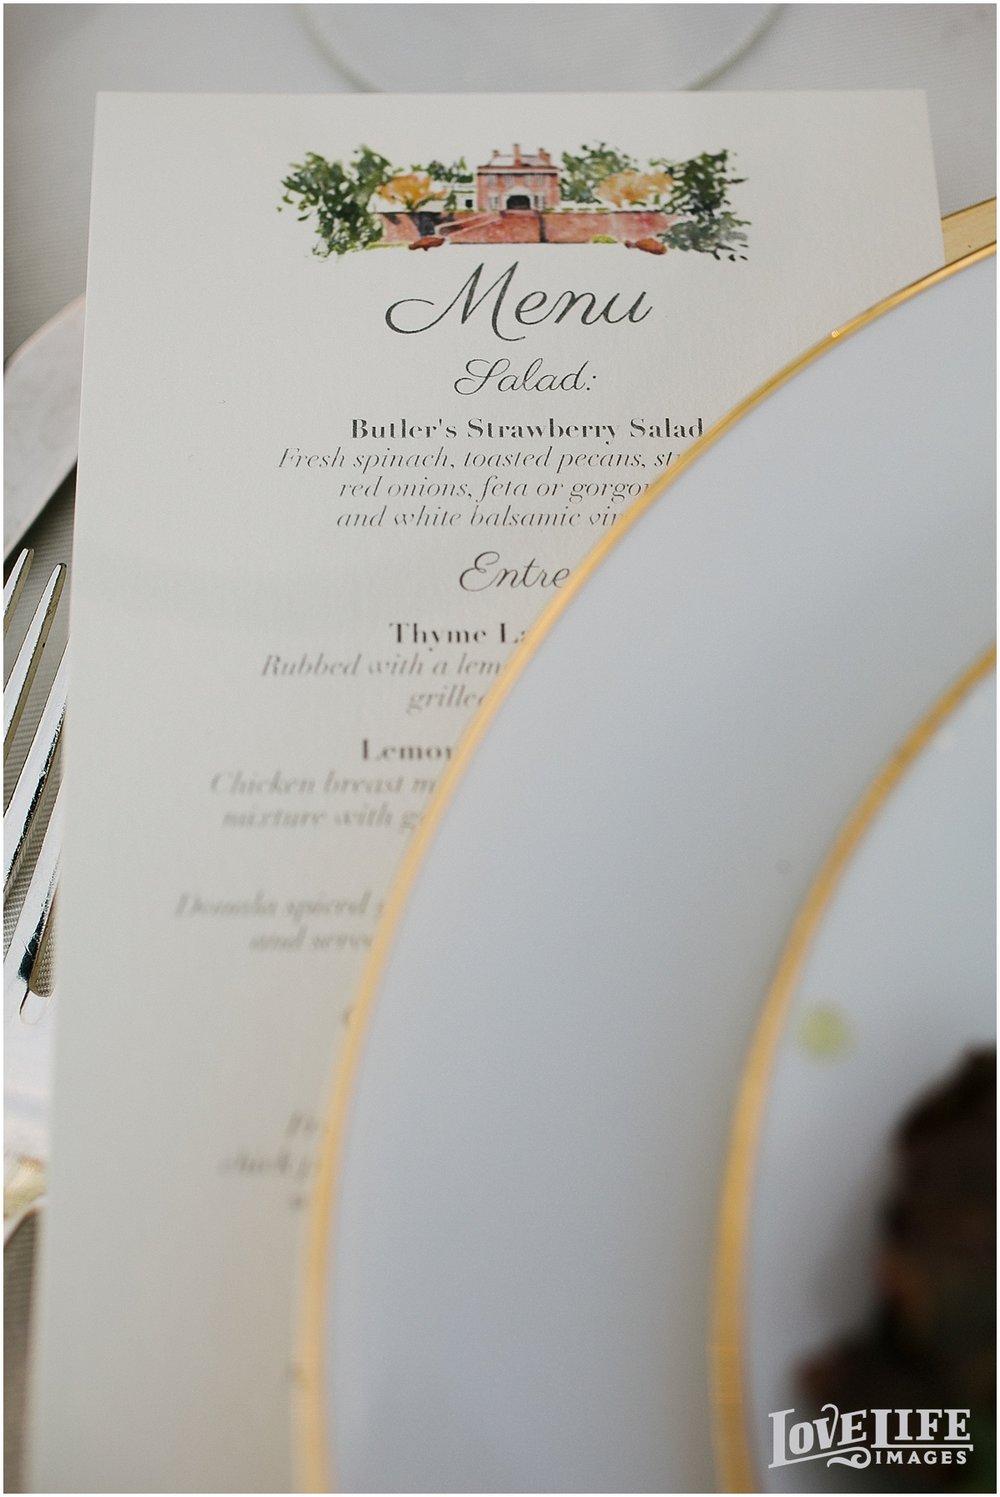 brielle-davis-events-oxon-hill-manor-wedding-dinner-menu.jpg